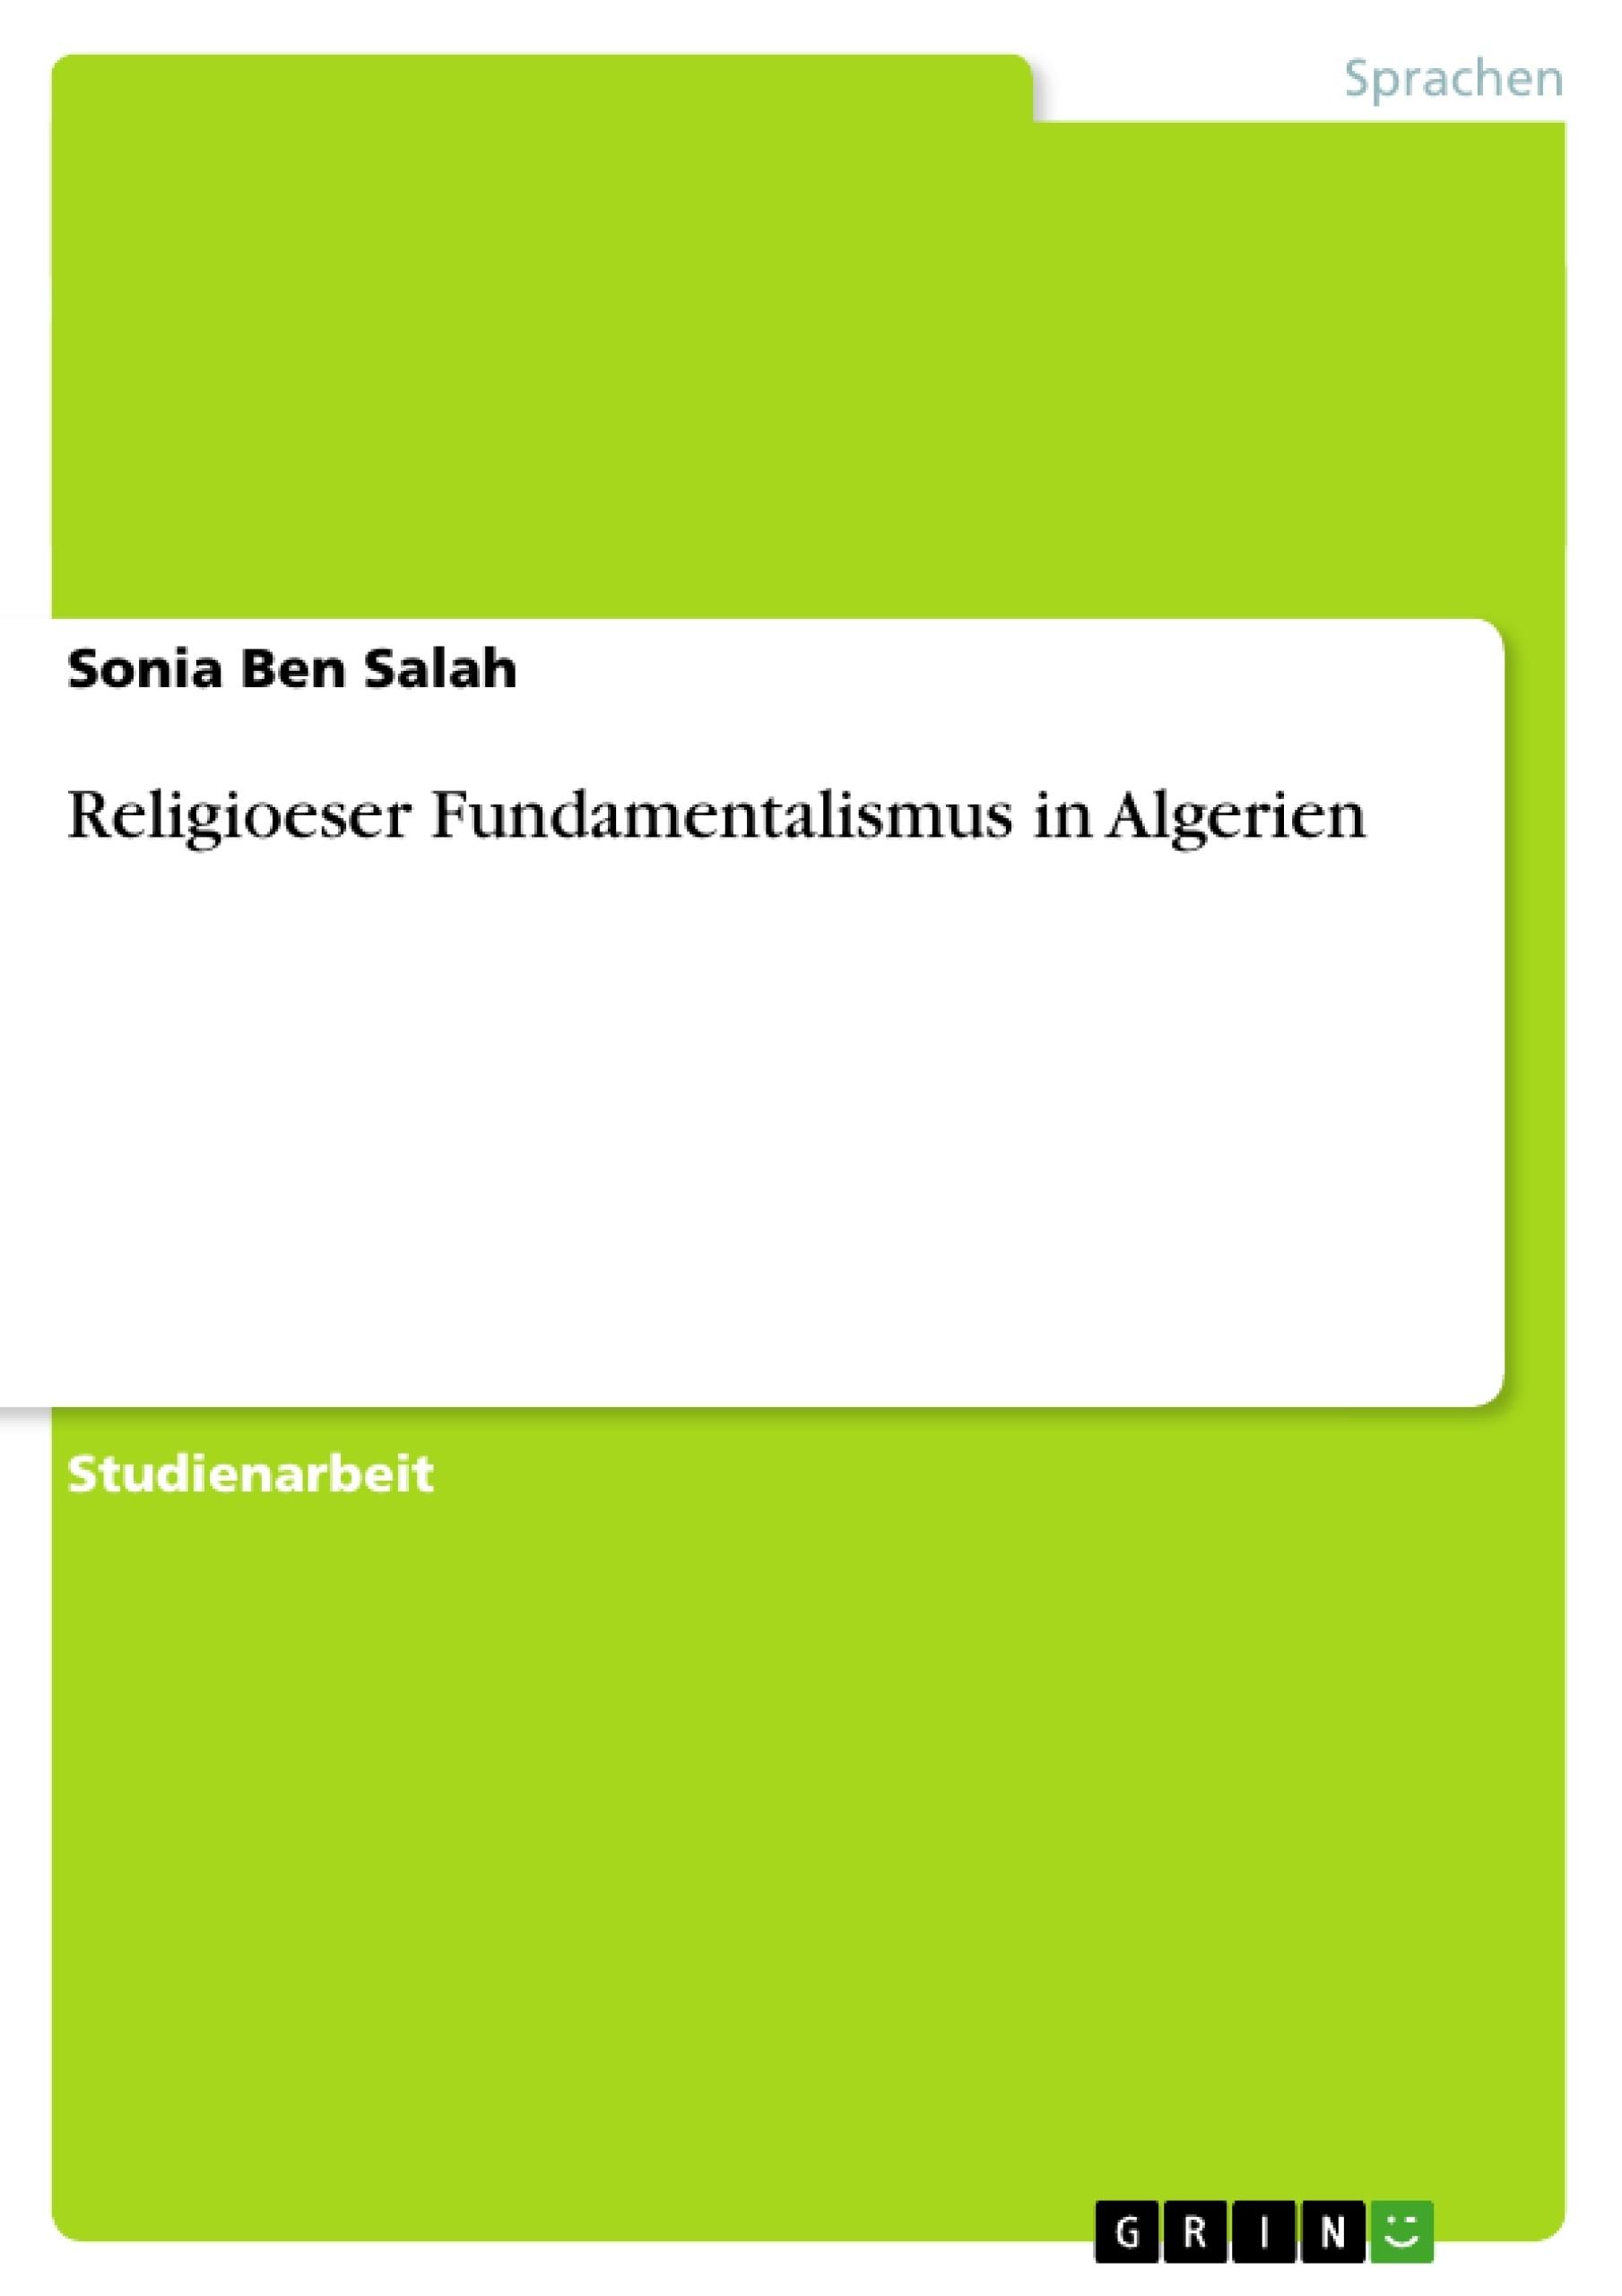 Titel: Religioeser Fundamentalismus in Algerien